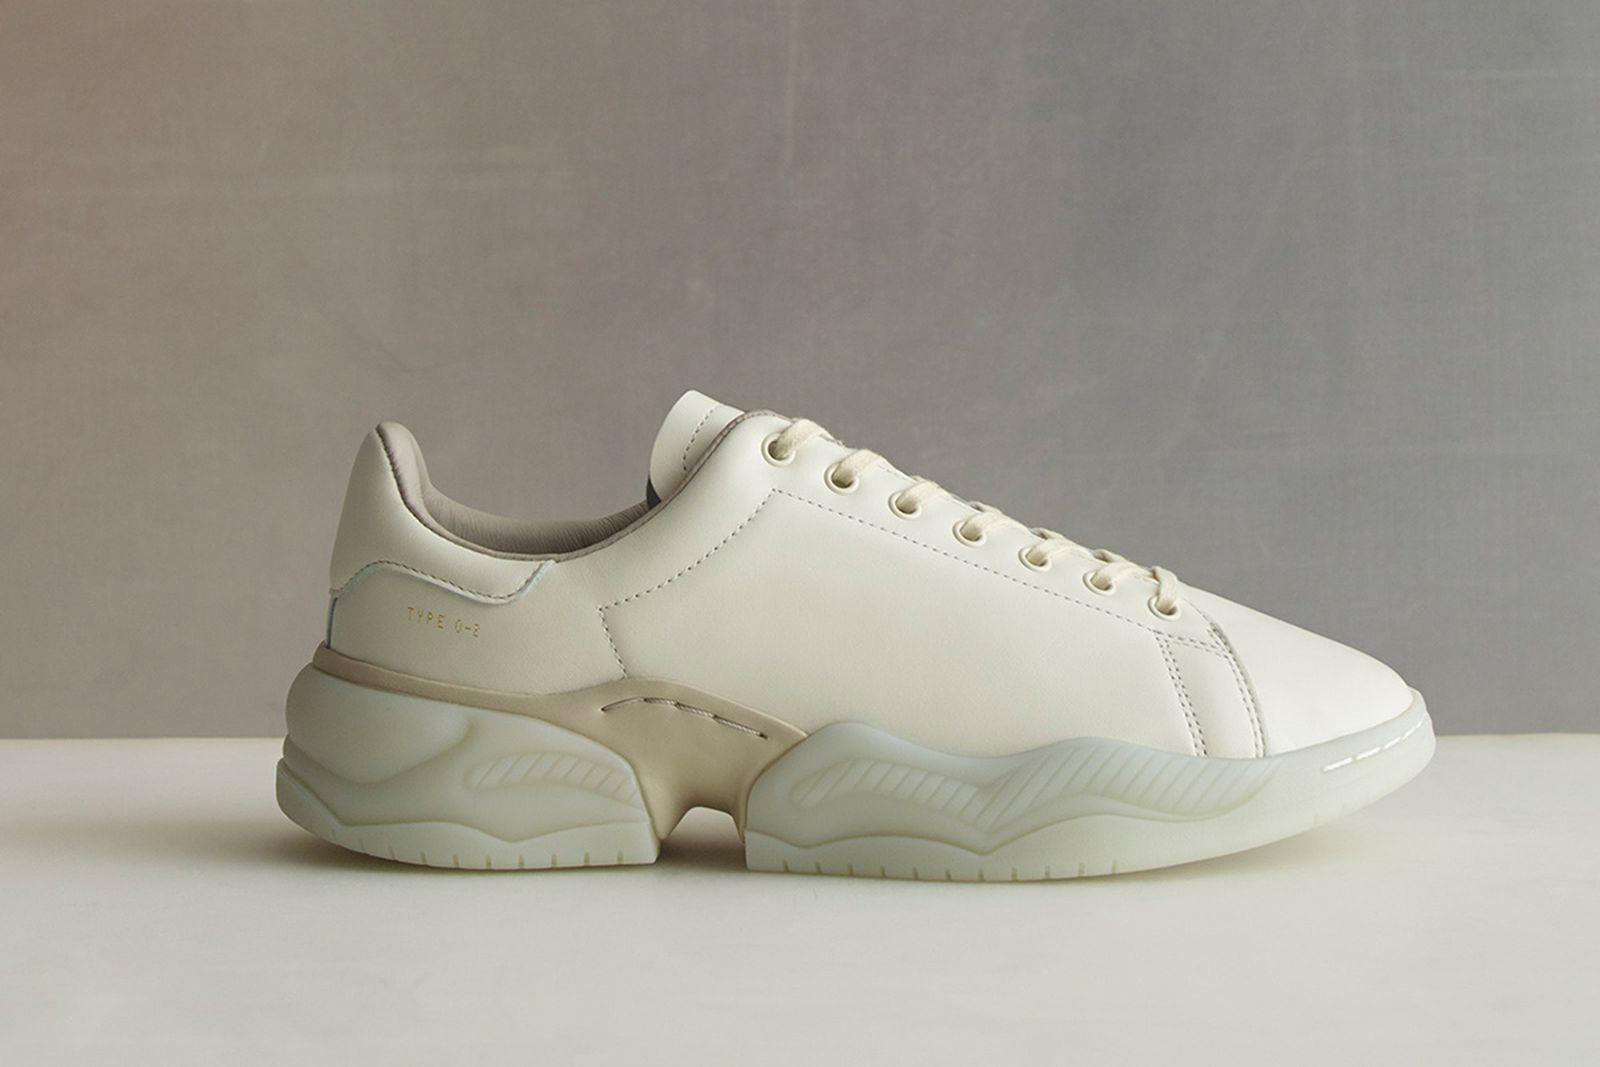 oamc-adidas-originals-ss20-release-date-price-05